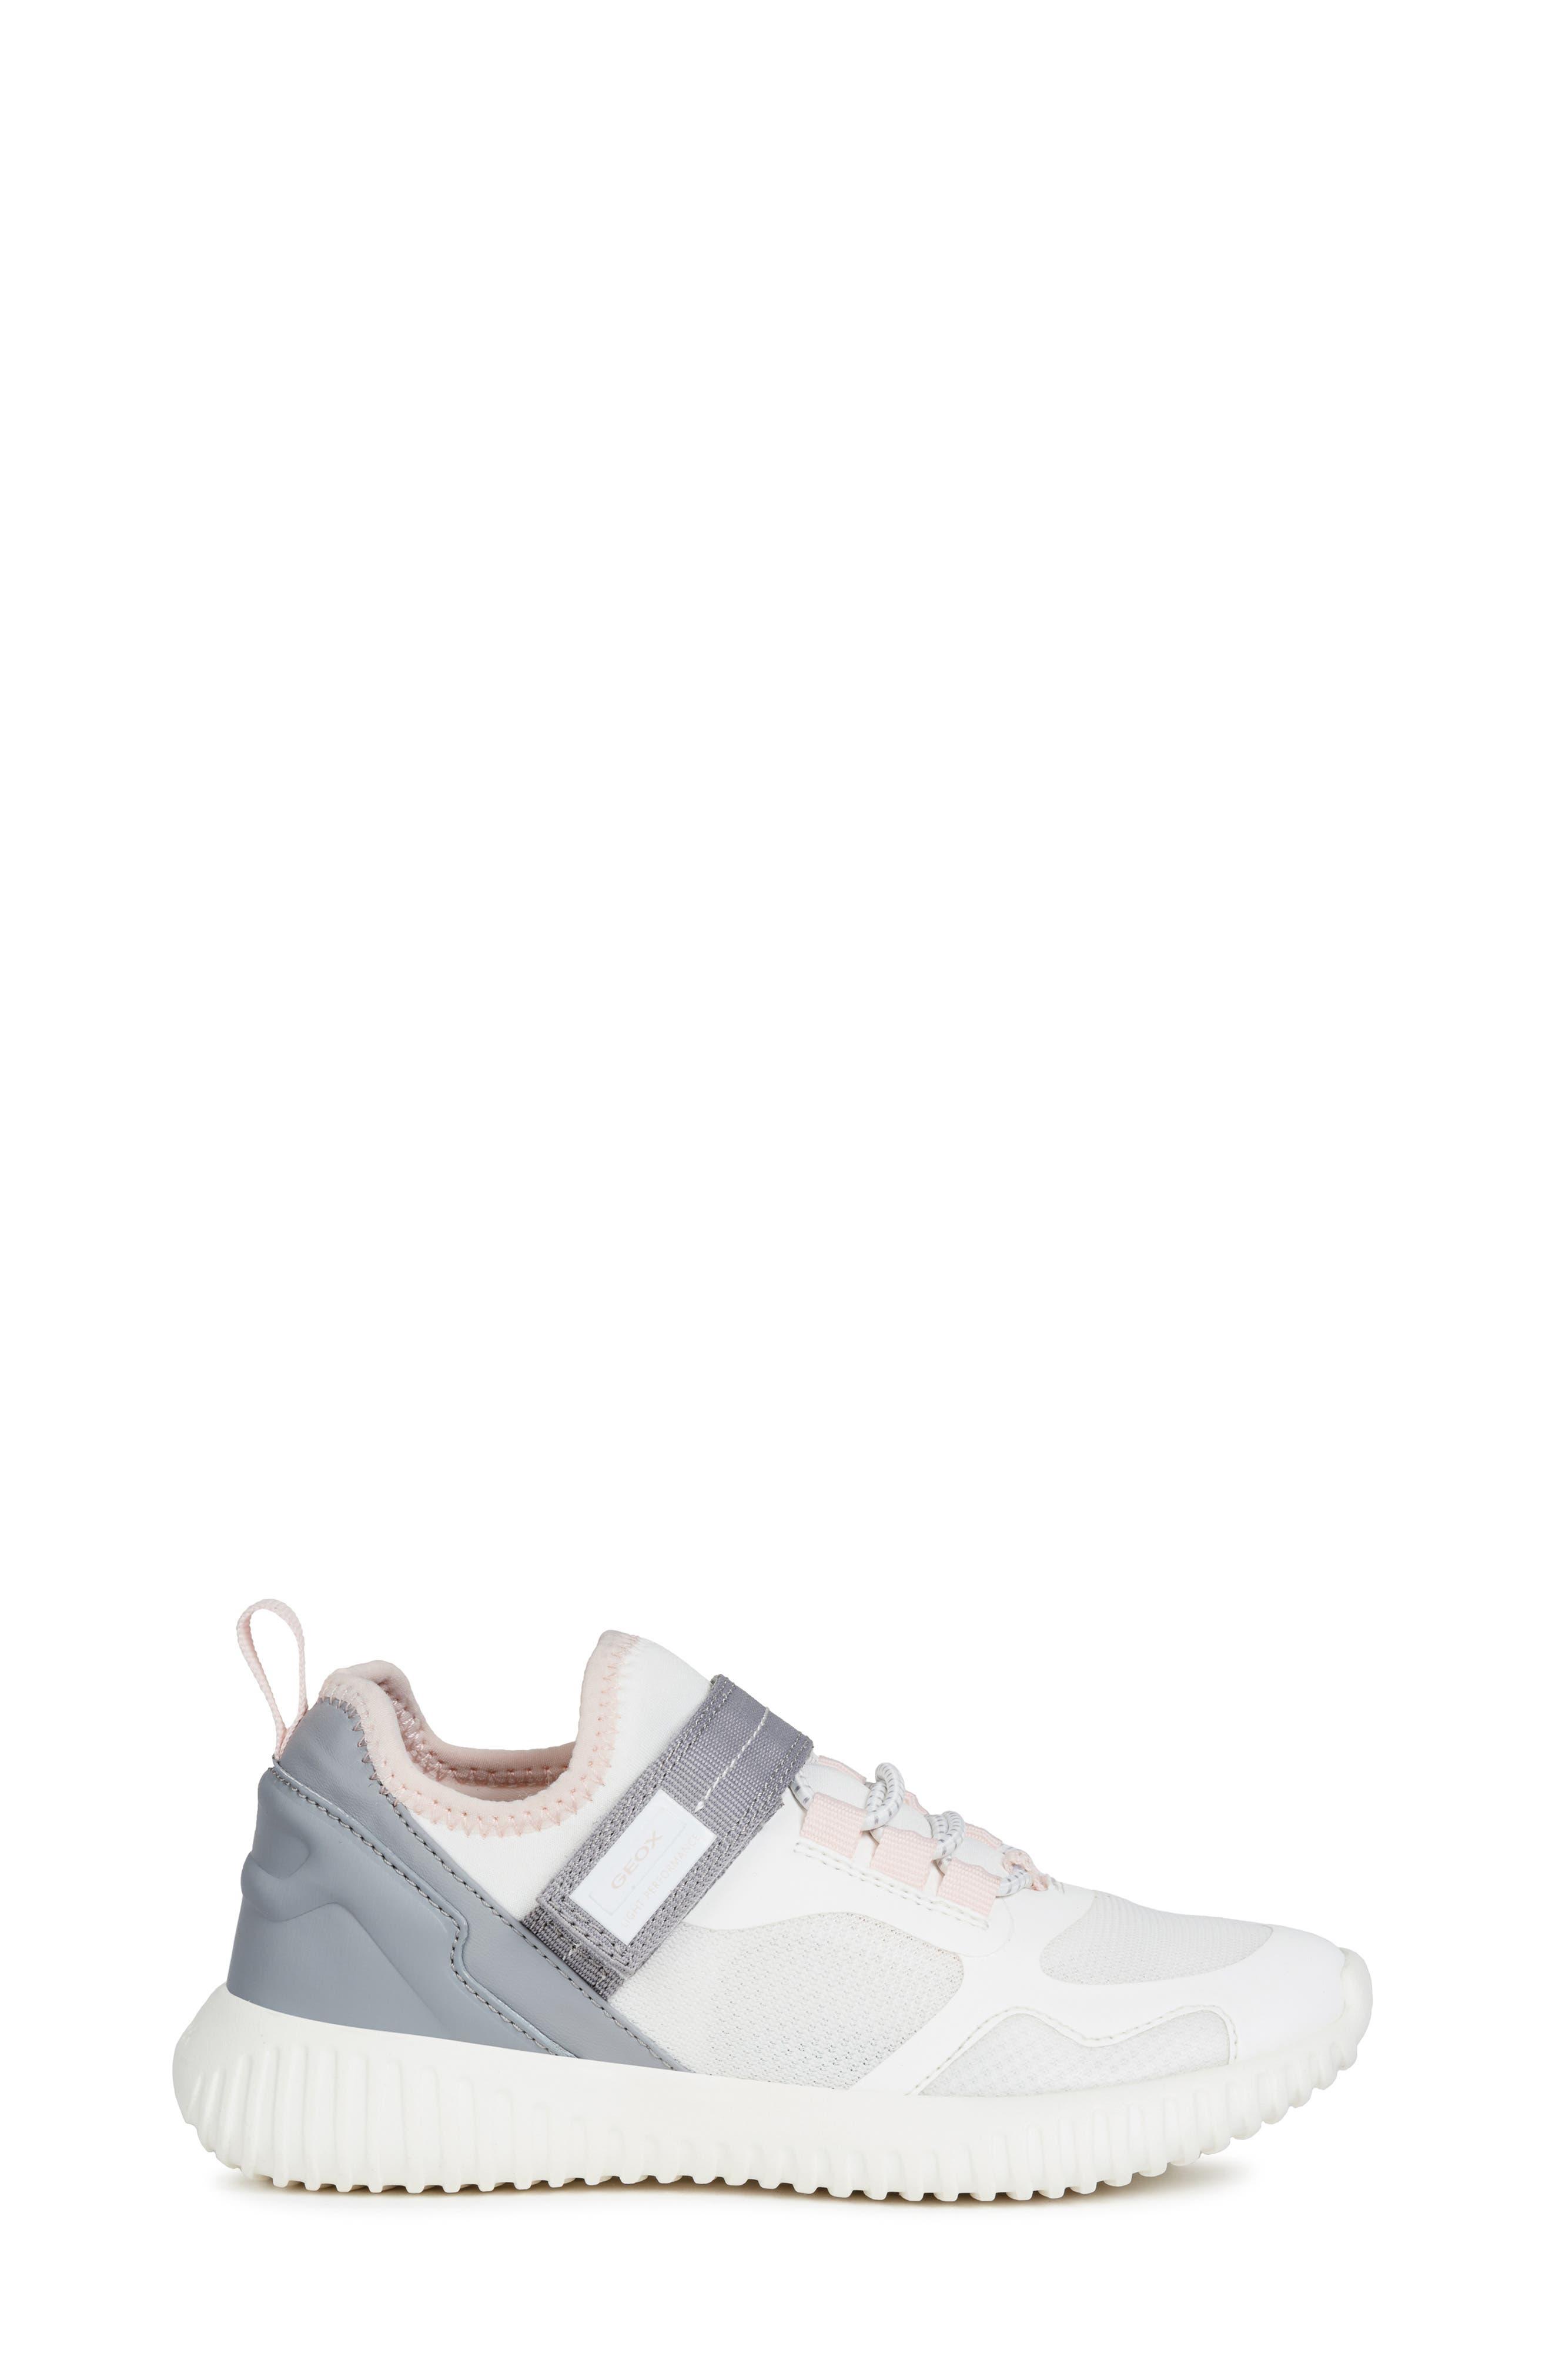 GEOX, Waviness Sneaker, Alternate thumbnail 3, color, WHITE/ GREY